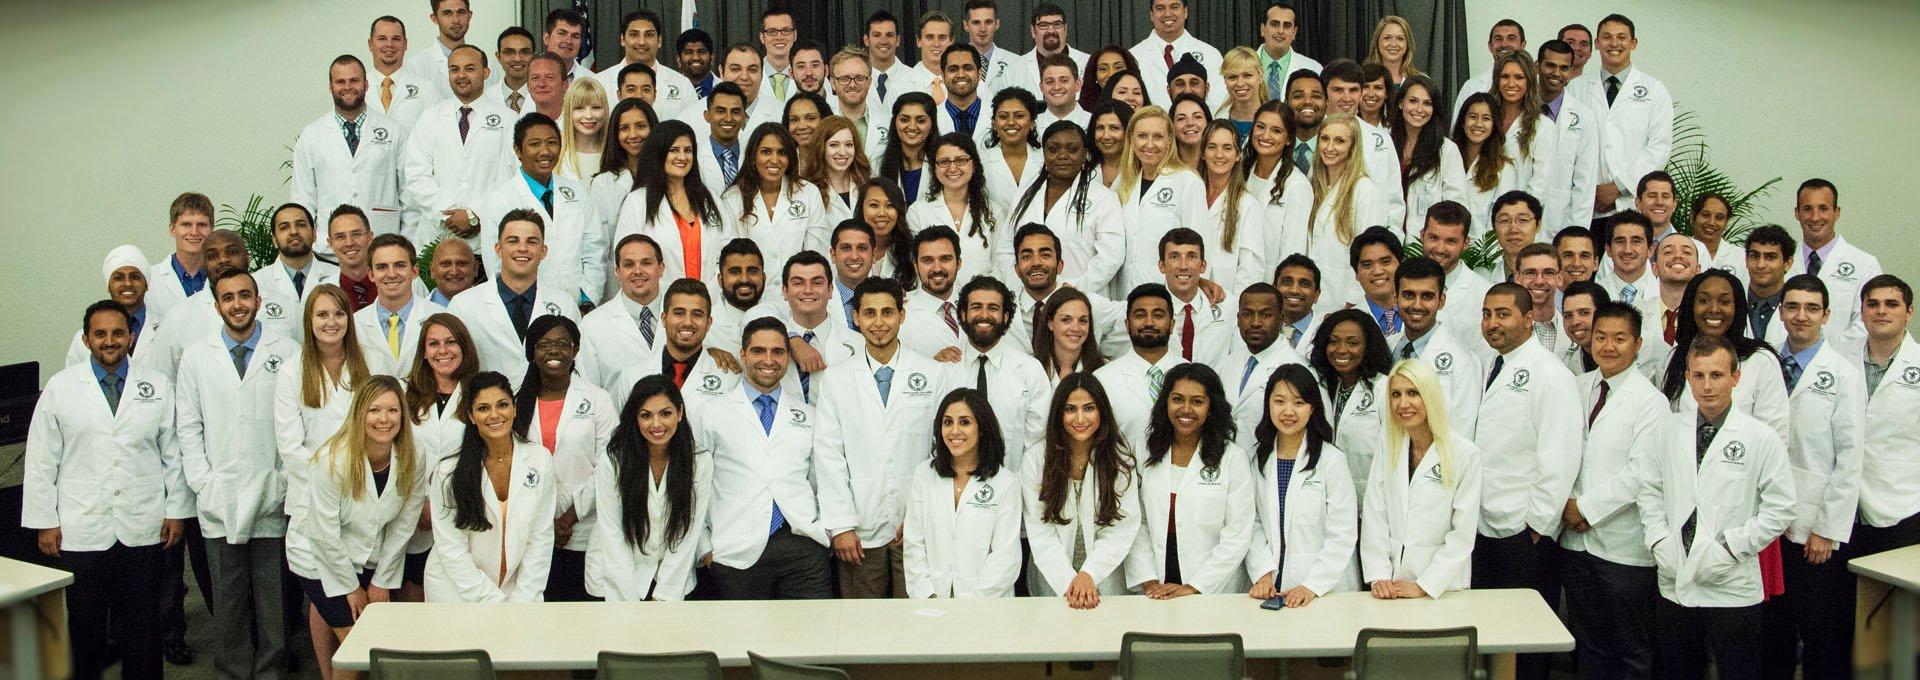 Study General Medicine